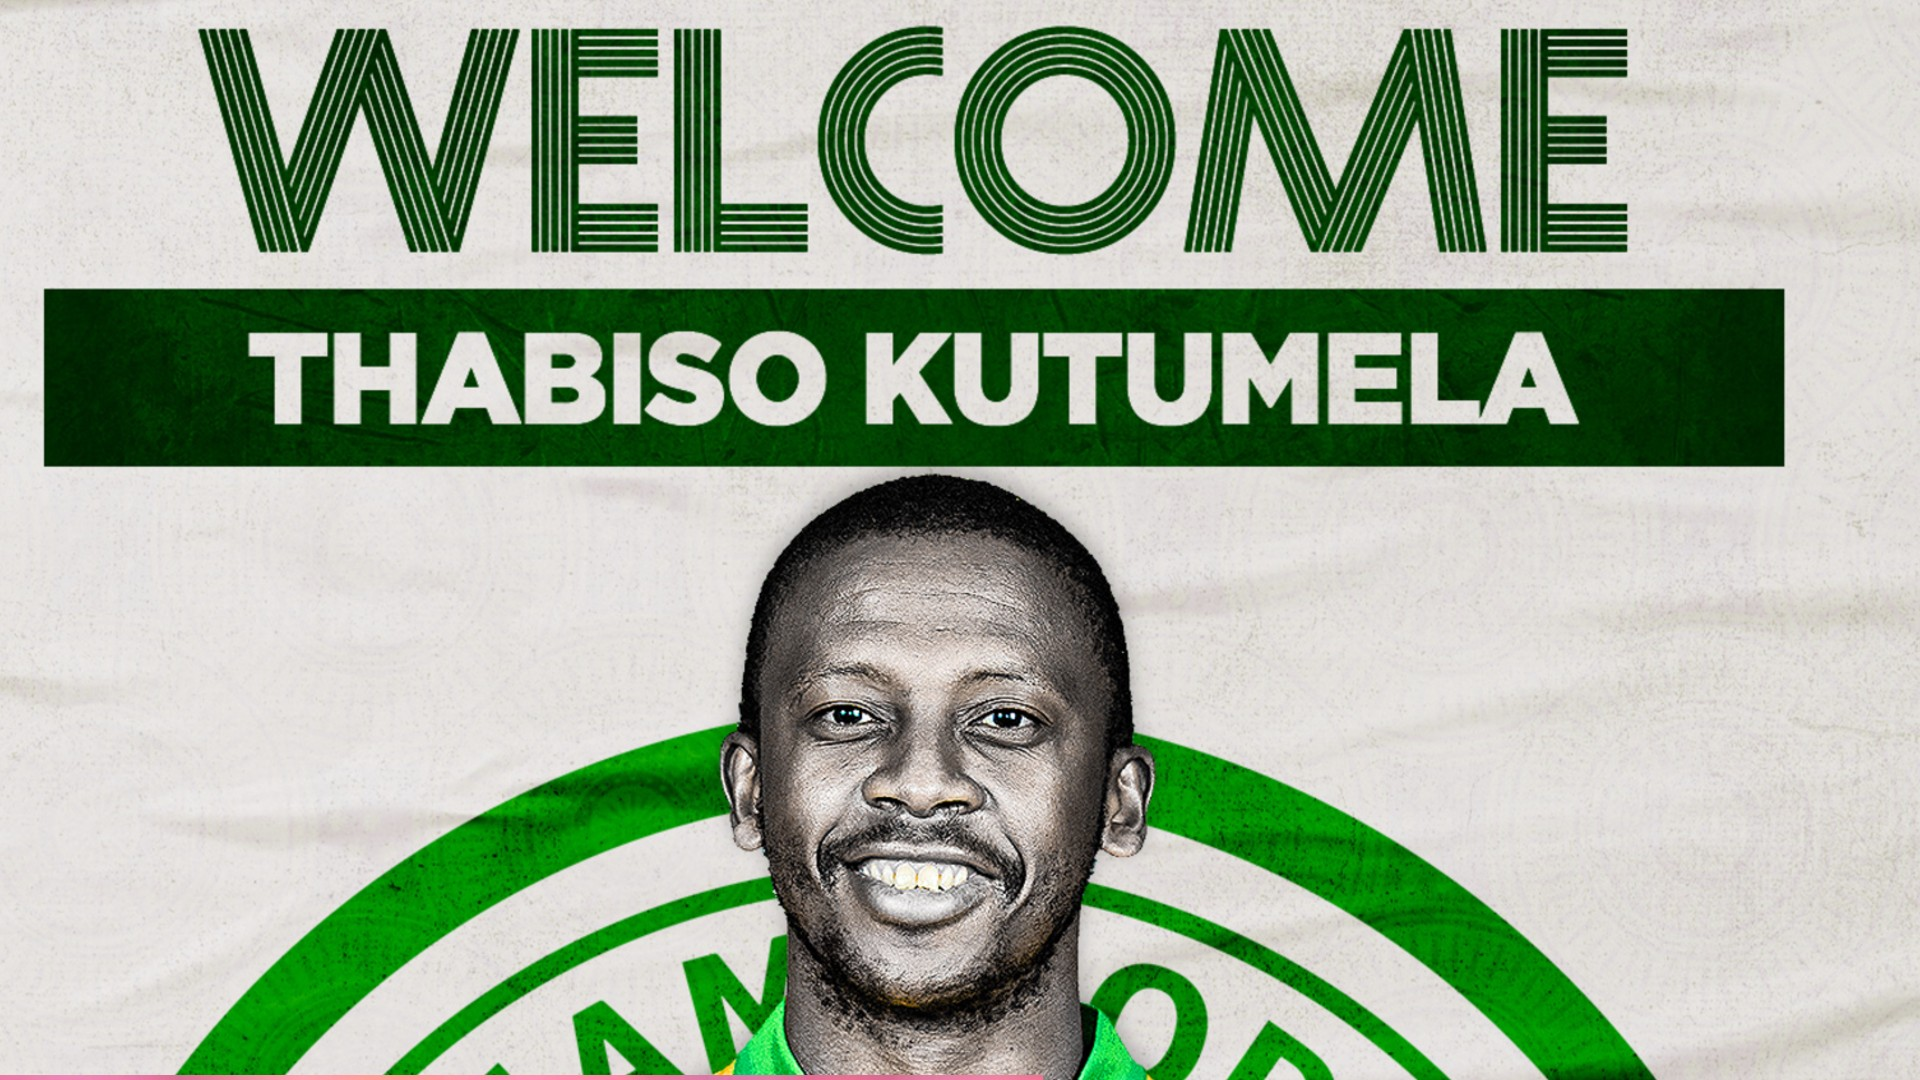 Mamelodi Sundowns' new signings for 2021/22 season